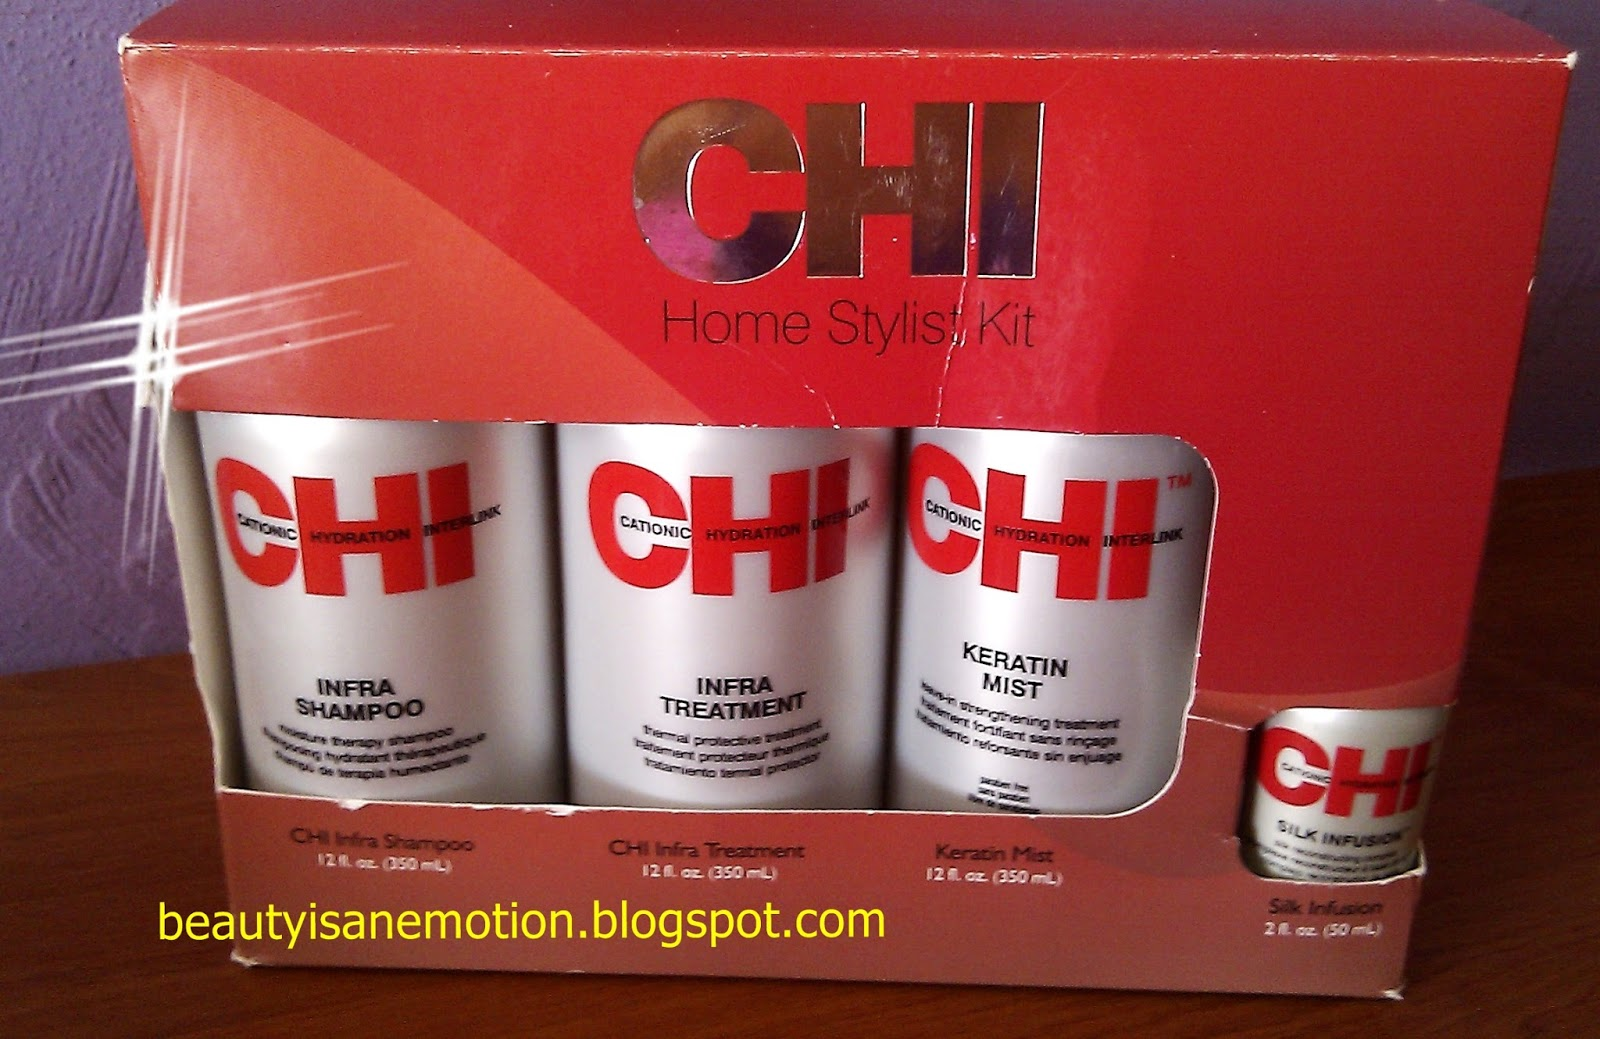 CHI Farouk θεραπεία μαλλιών review